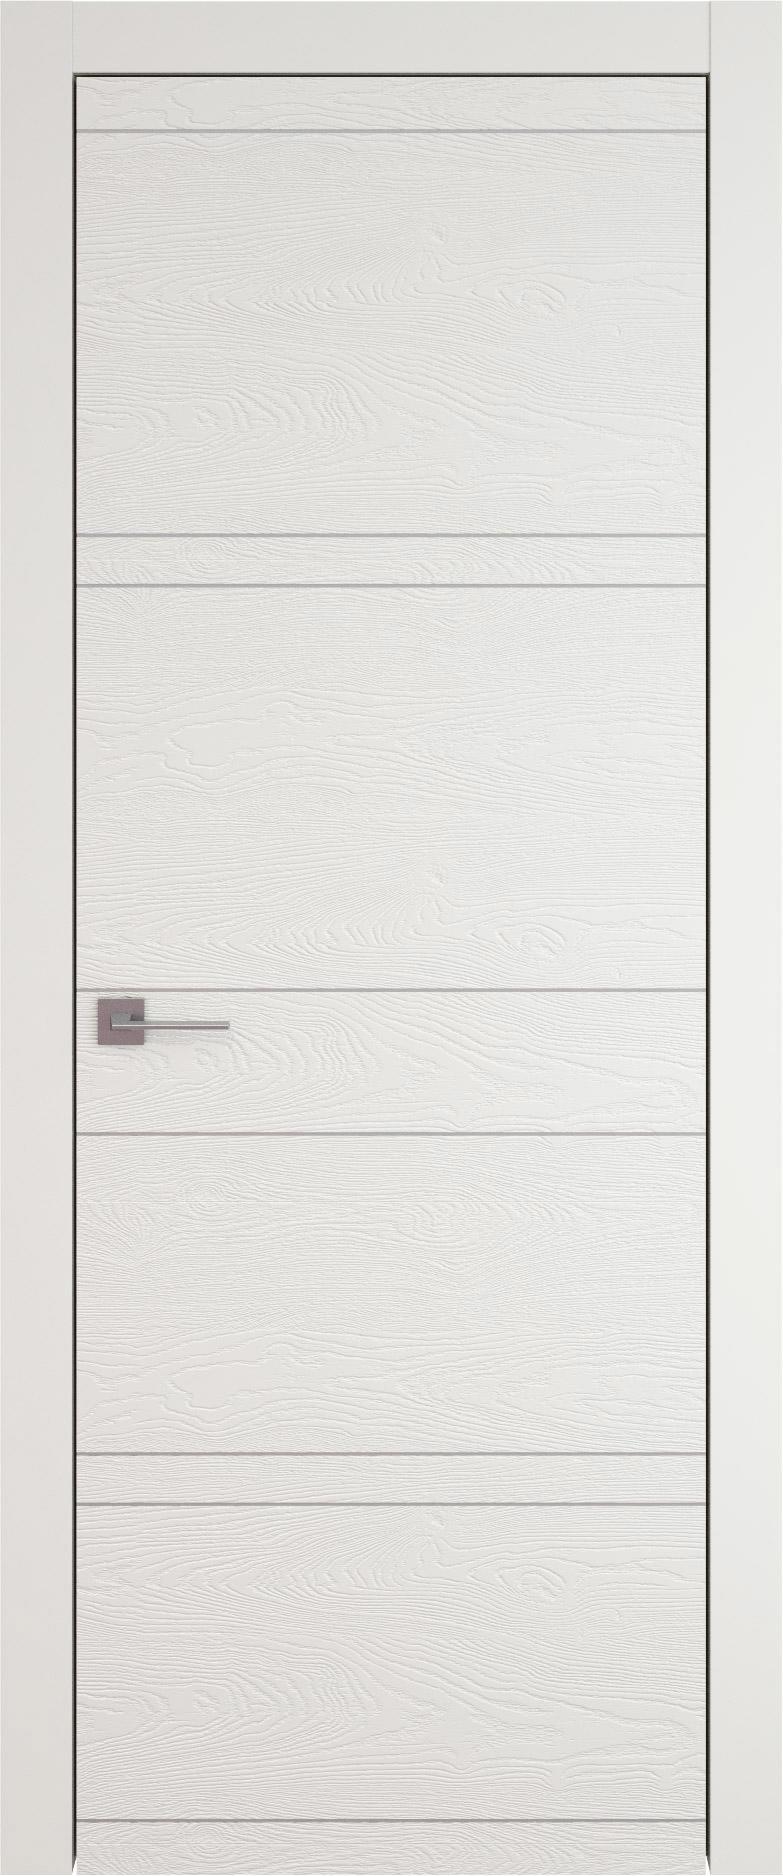 Tivoli Е-2 цвет - Бежевая эмаль по шпону (RAL 9010) Без стекла (ДГ)